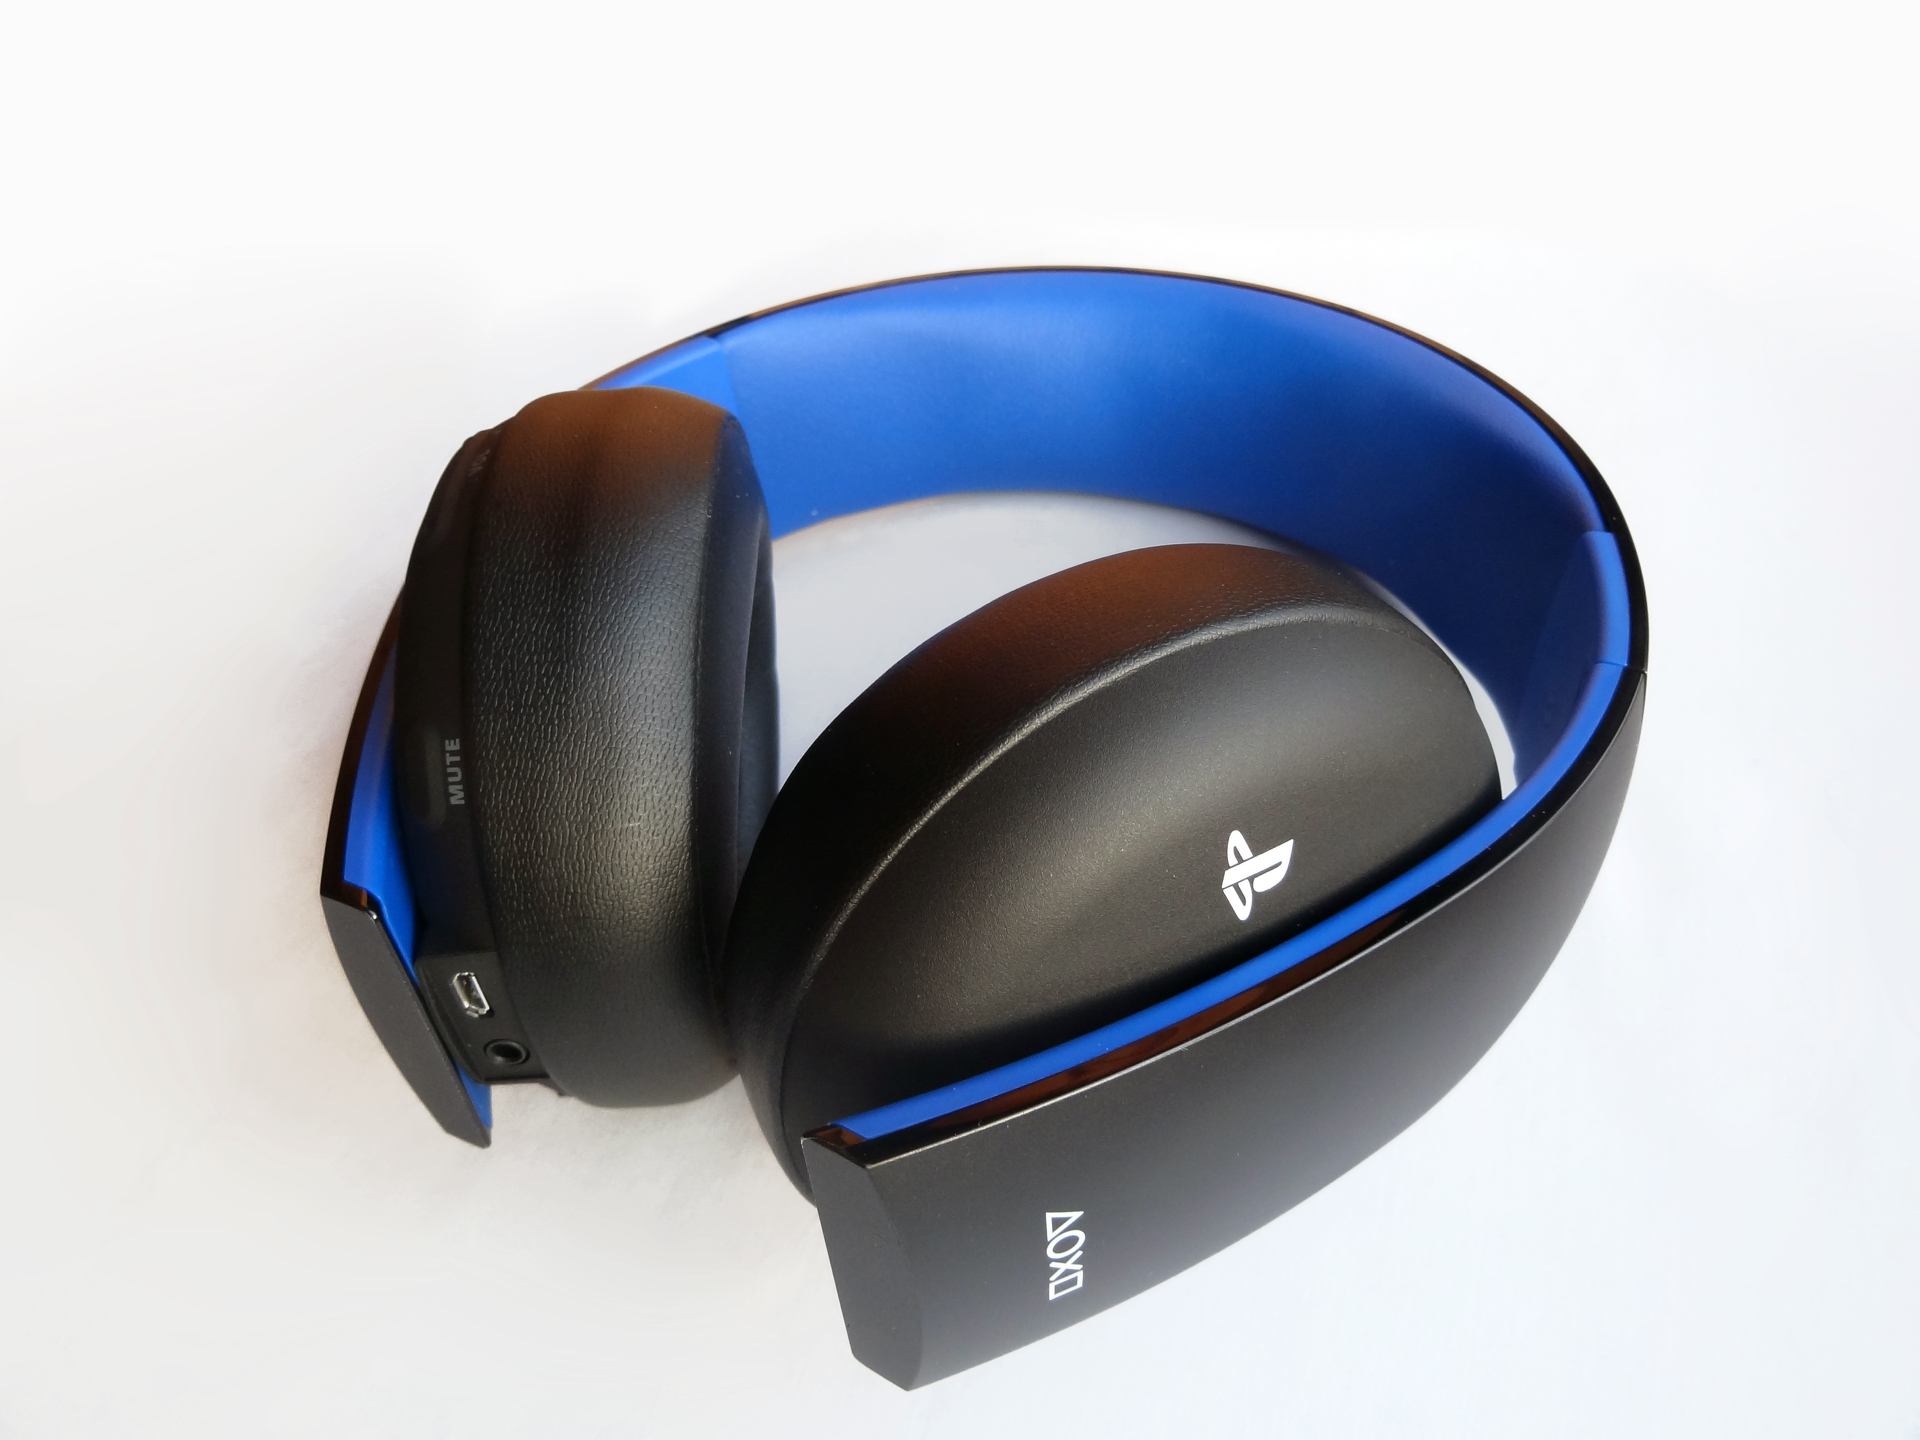 Hardware: Sony Gold Wireless Stereo Headset 9451